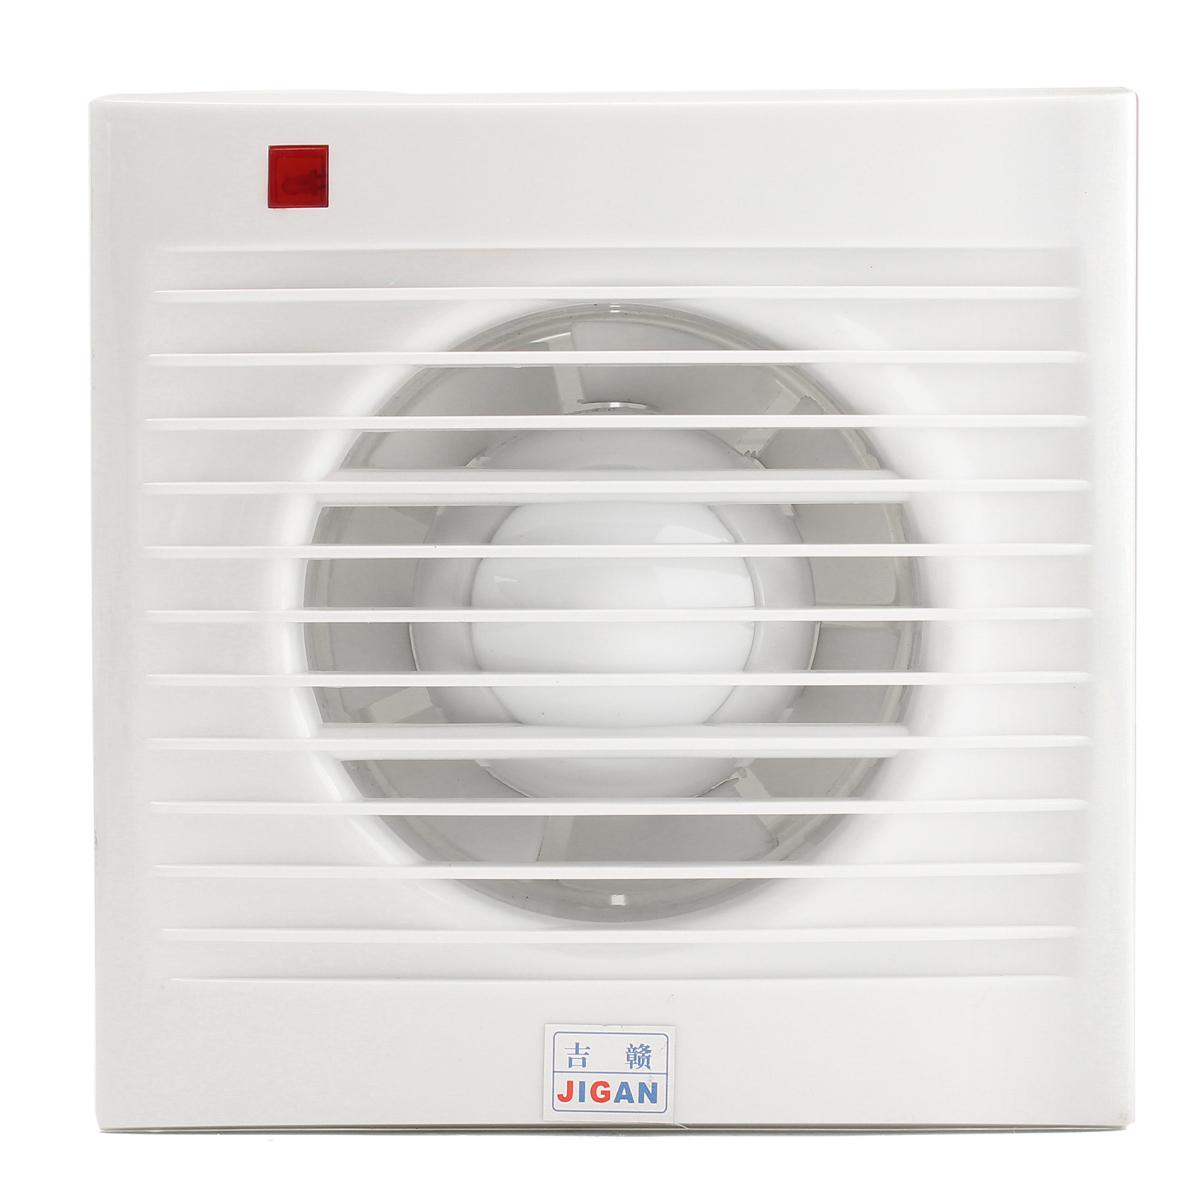 "4"" 6"" 8"" Waterproof Mute Bathroom Extractor Exhaust Fan Window For Kitchen Toilet Ventilation Fans"